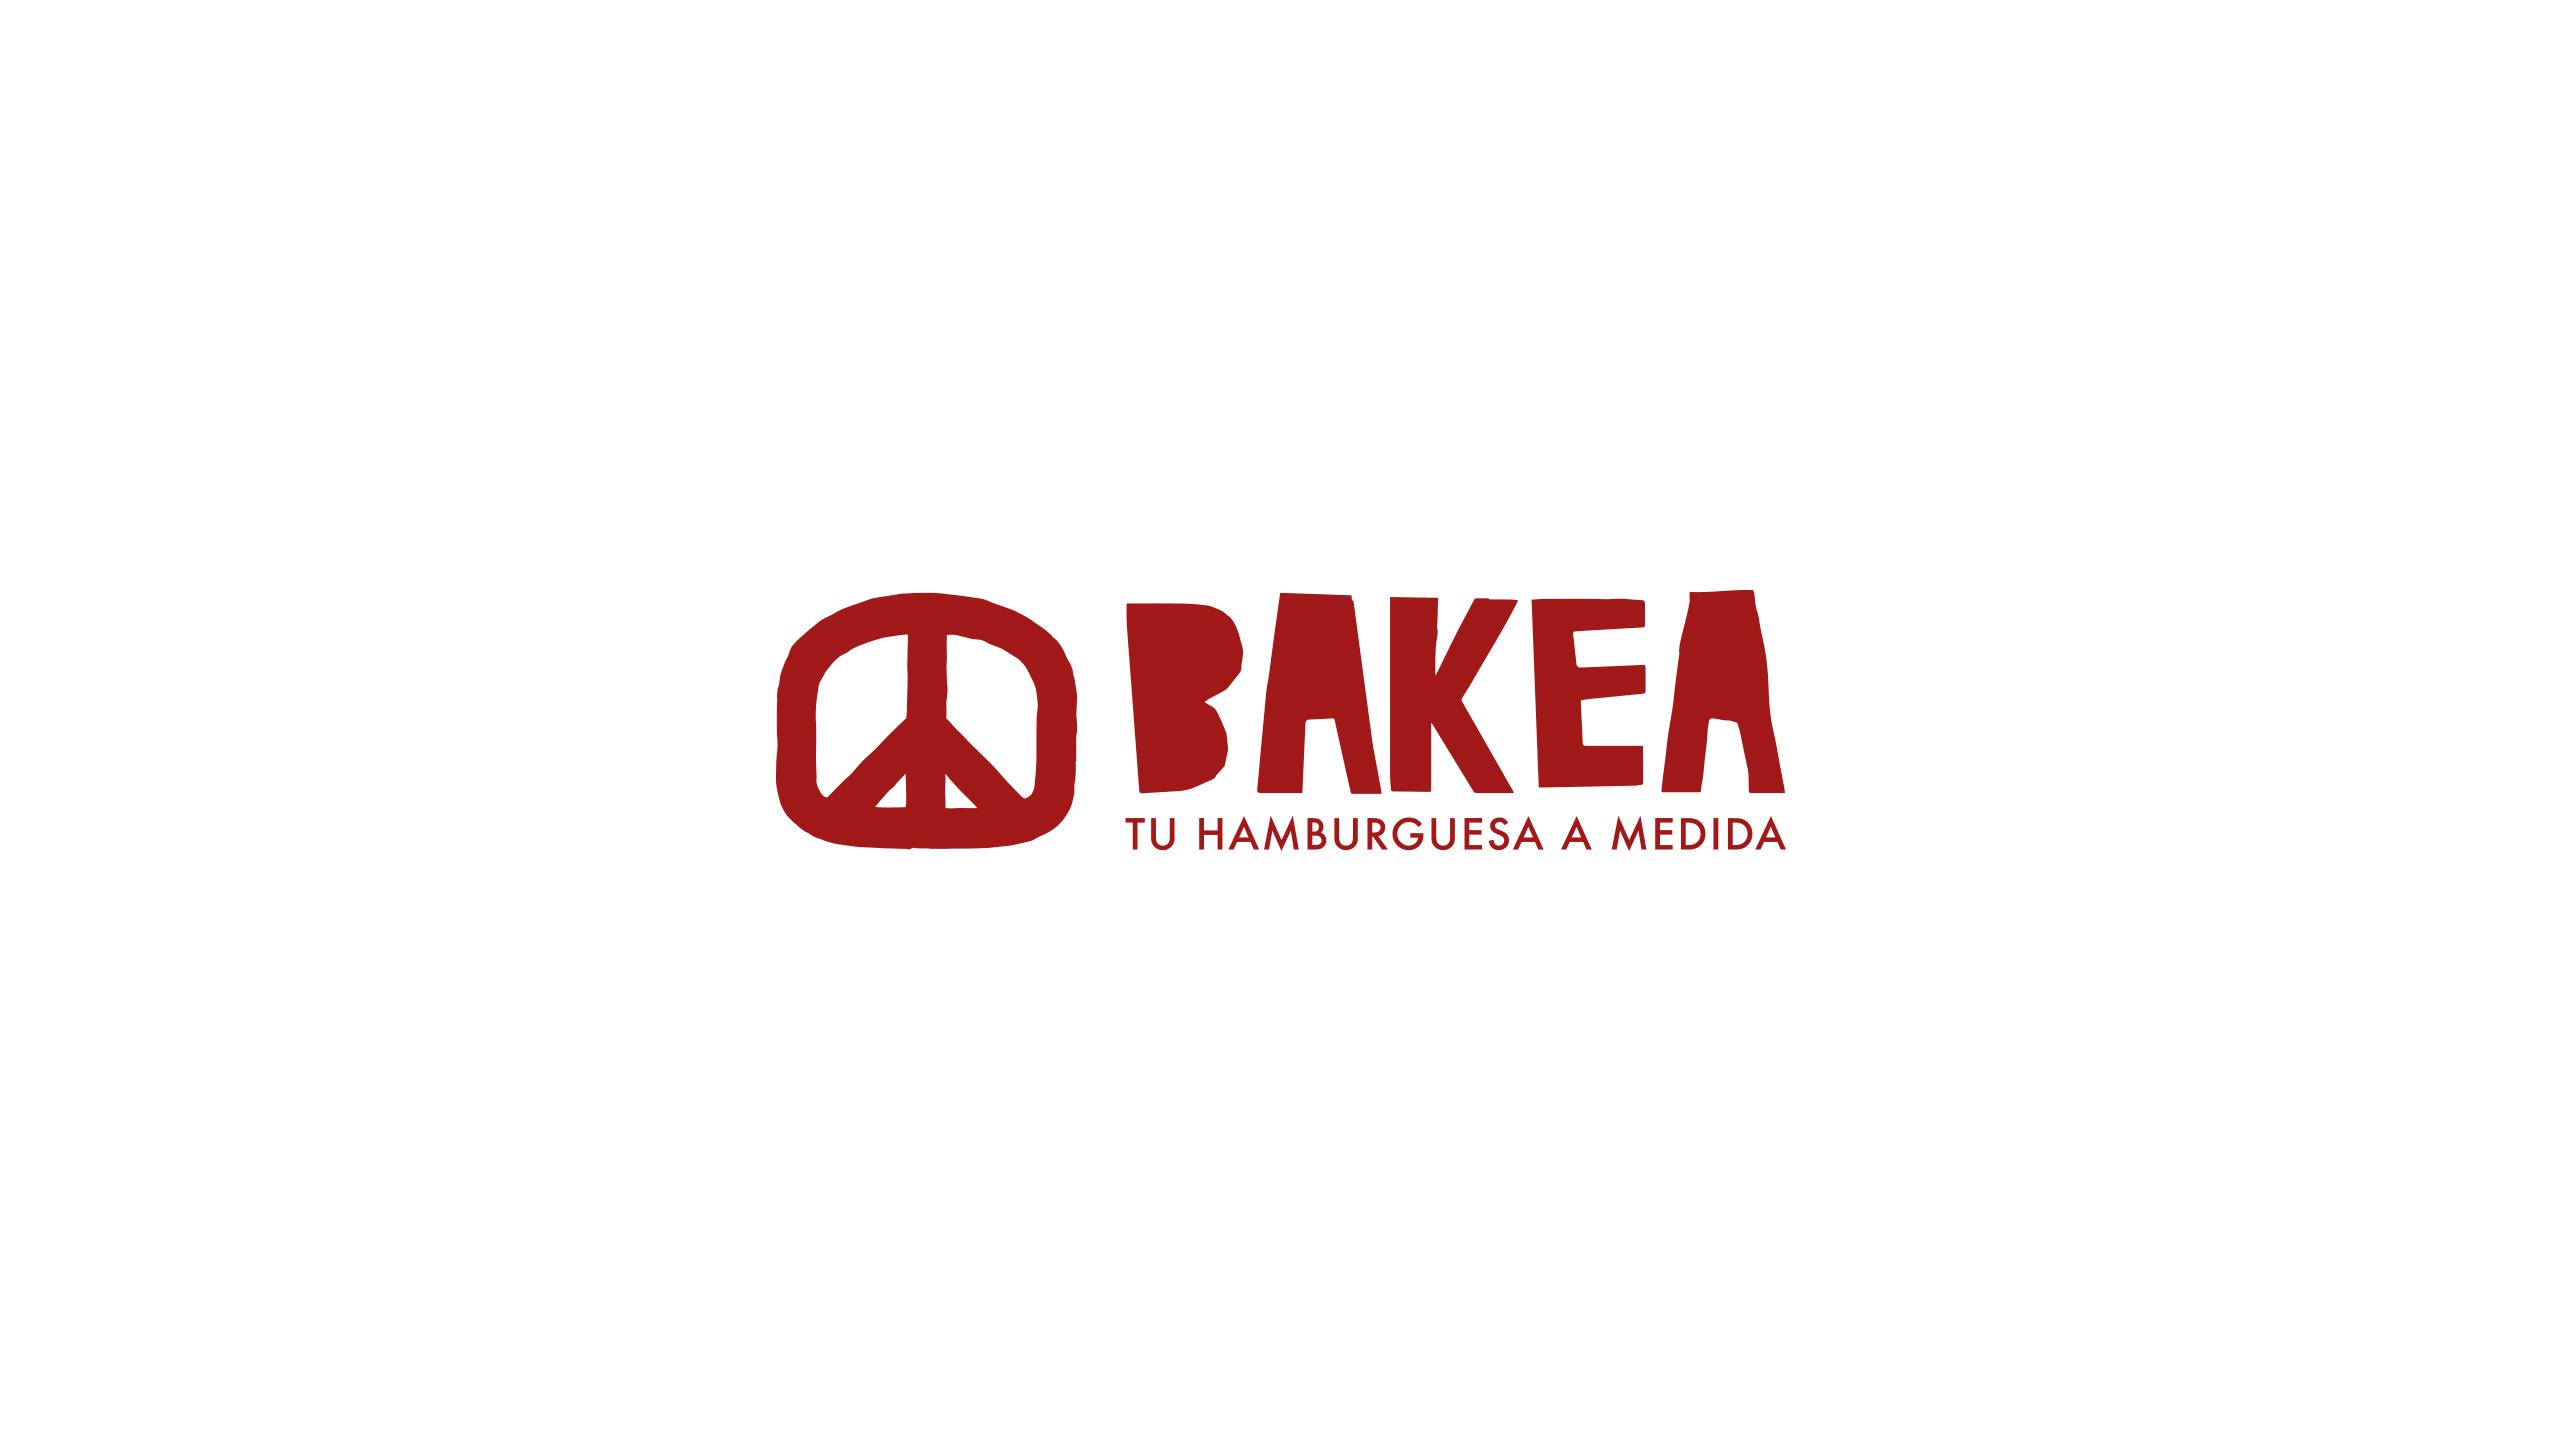 kamikaze_identidad_bakea_06